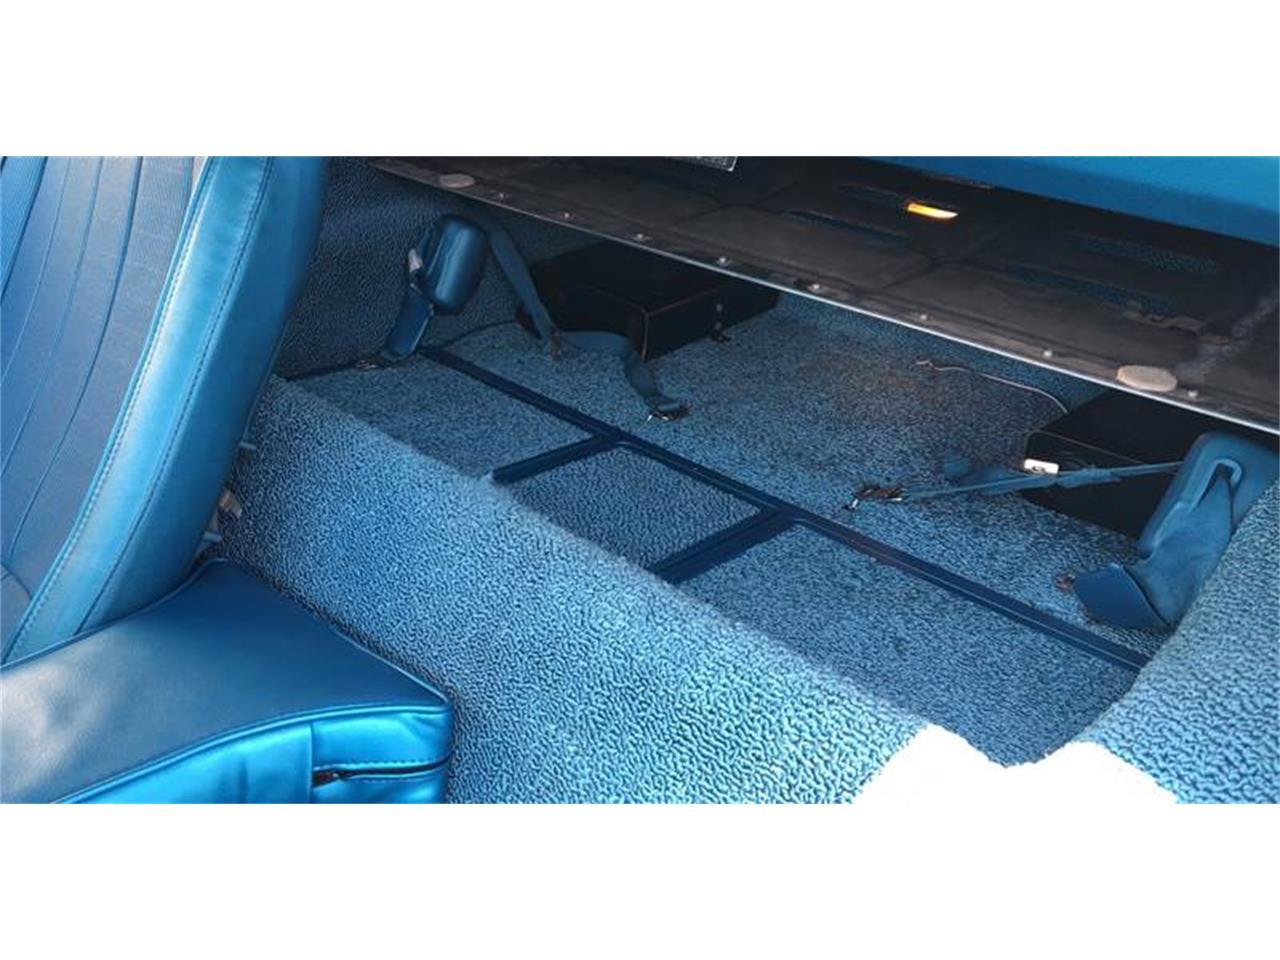 Large Picture of '69 Chevrolet Corvette located in Brea California - QEIM